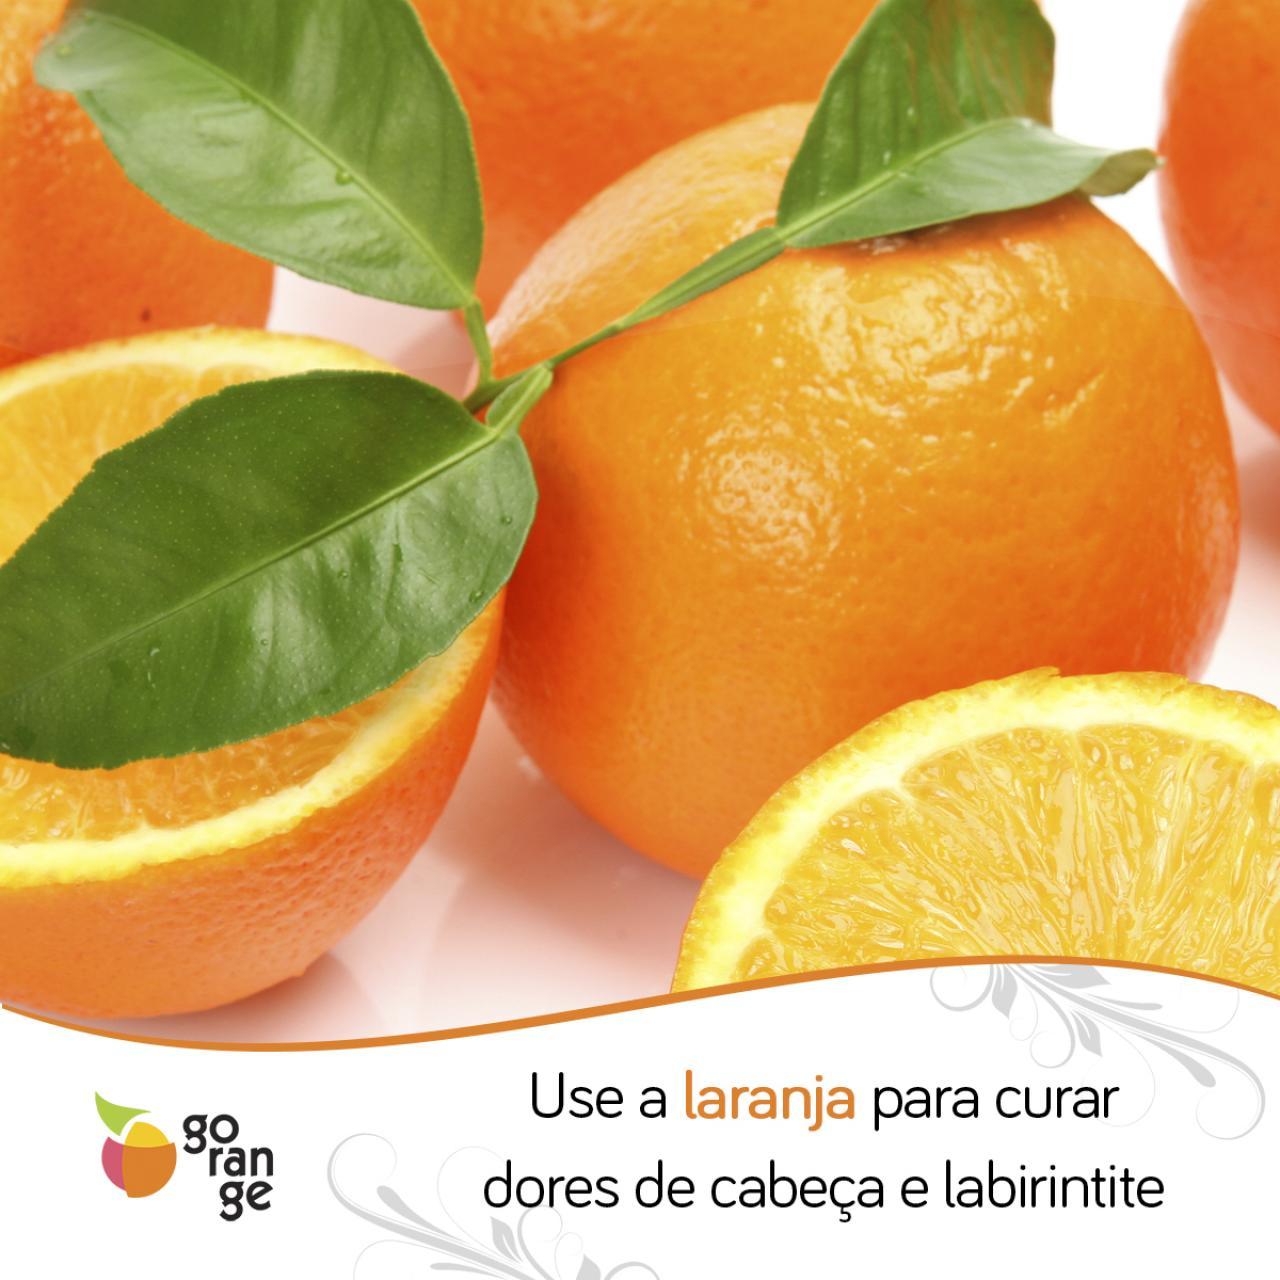 Use a laranja para curar enxaqueca e labirintite